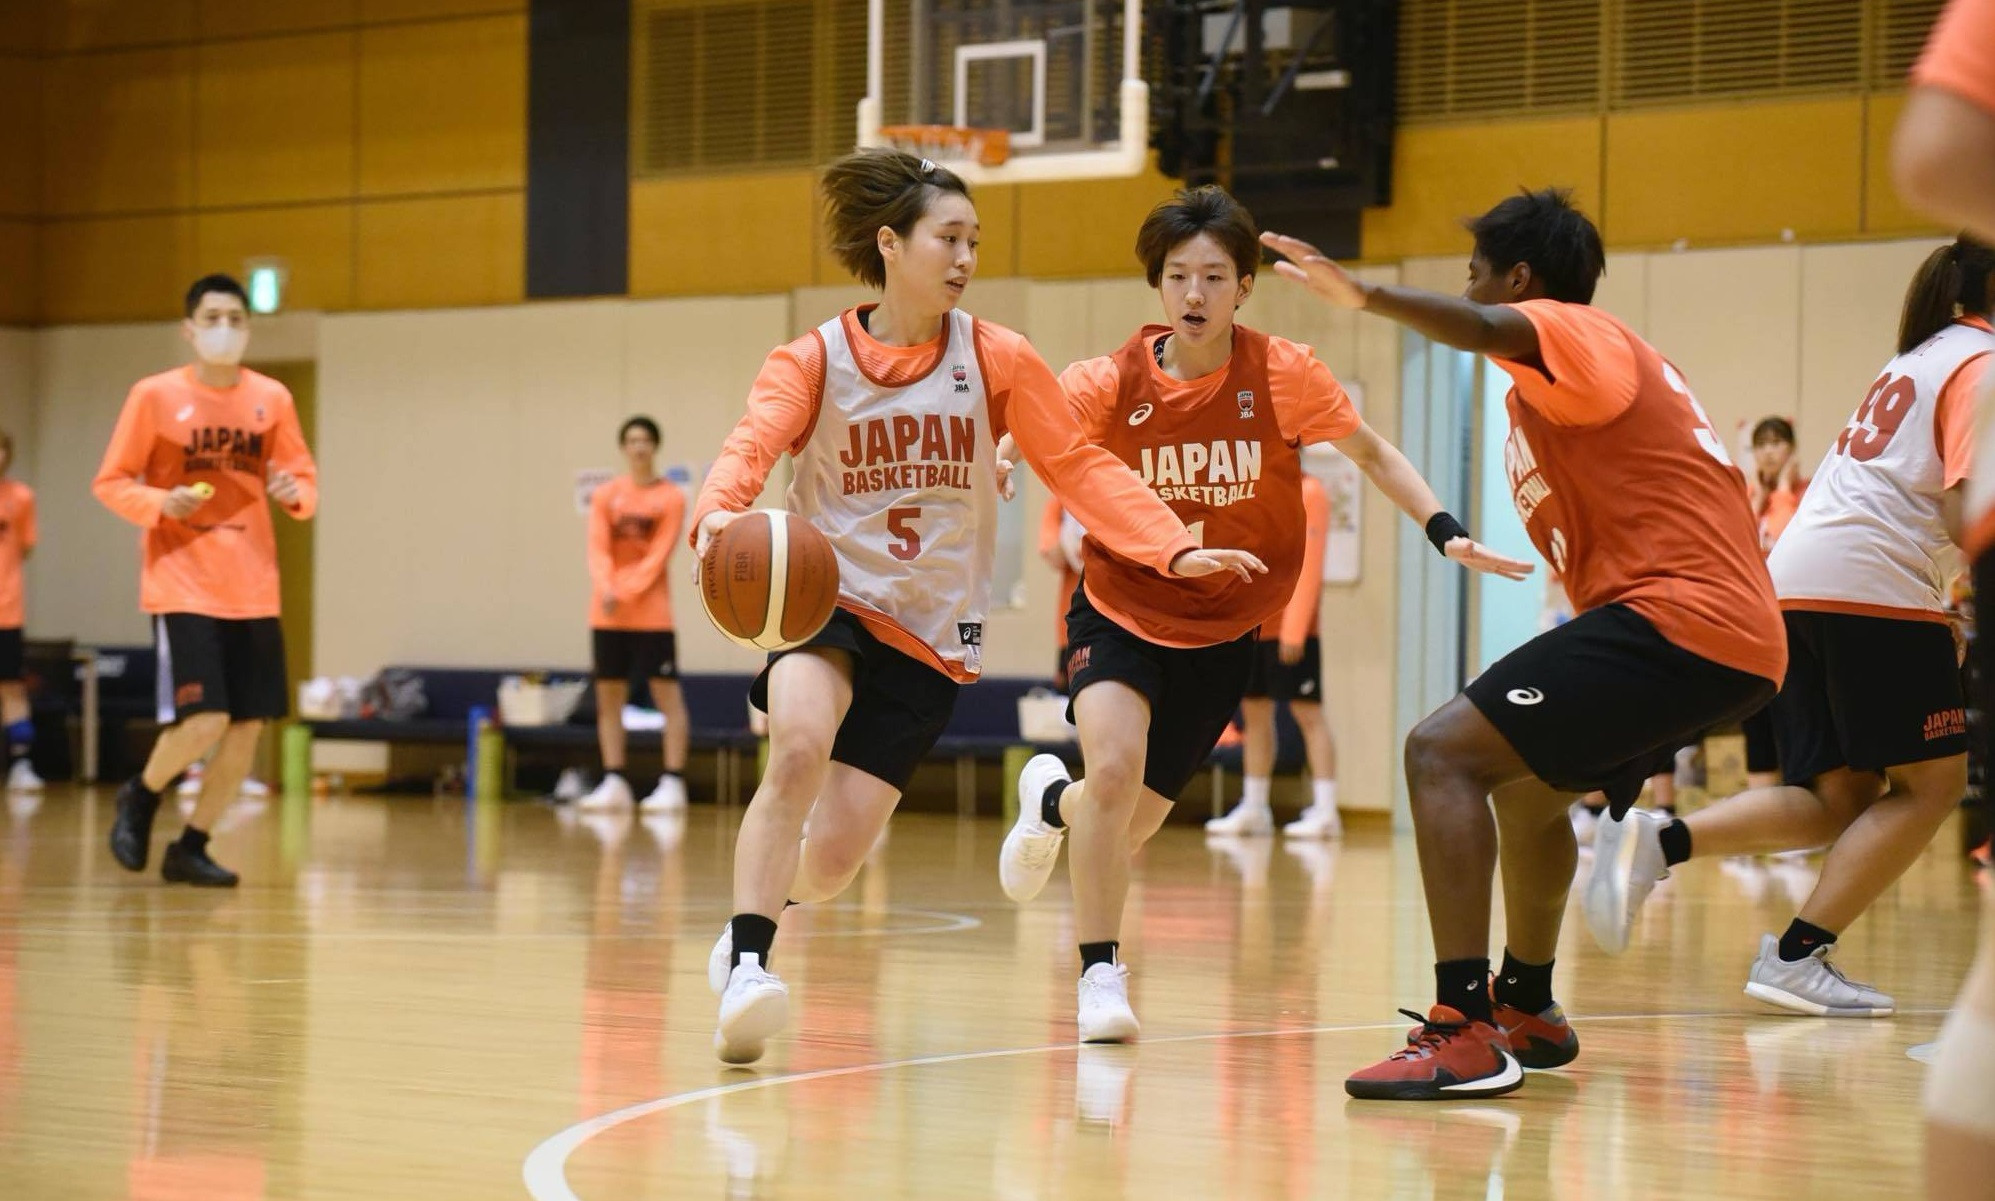 Japan women's basketball team eye new talent to replace Osaki and Yoshida